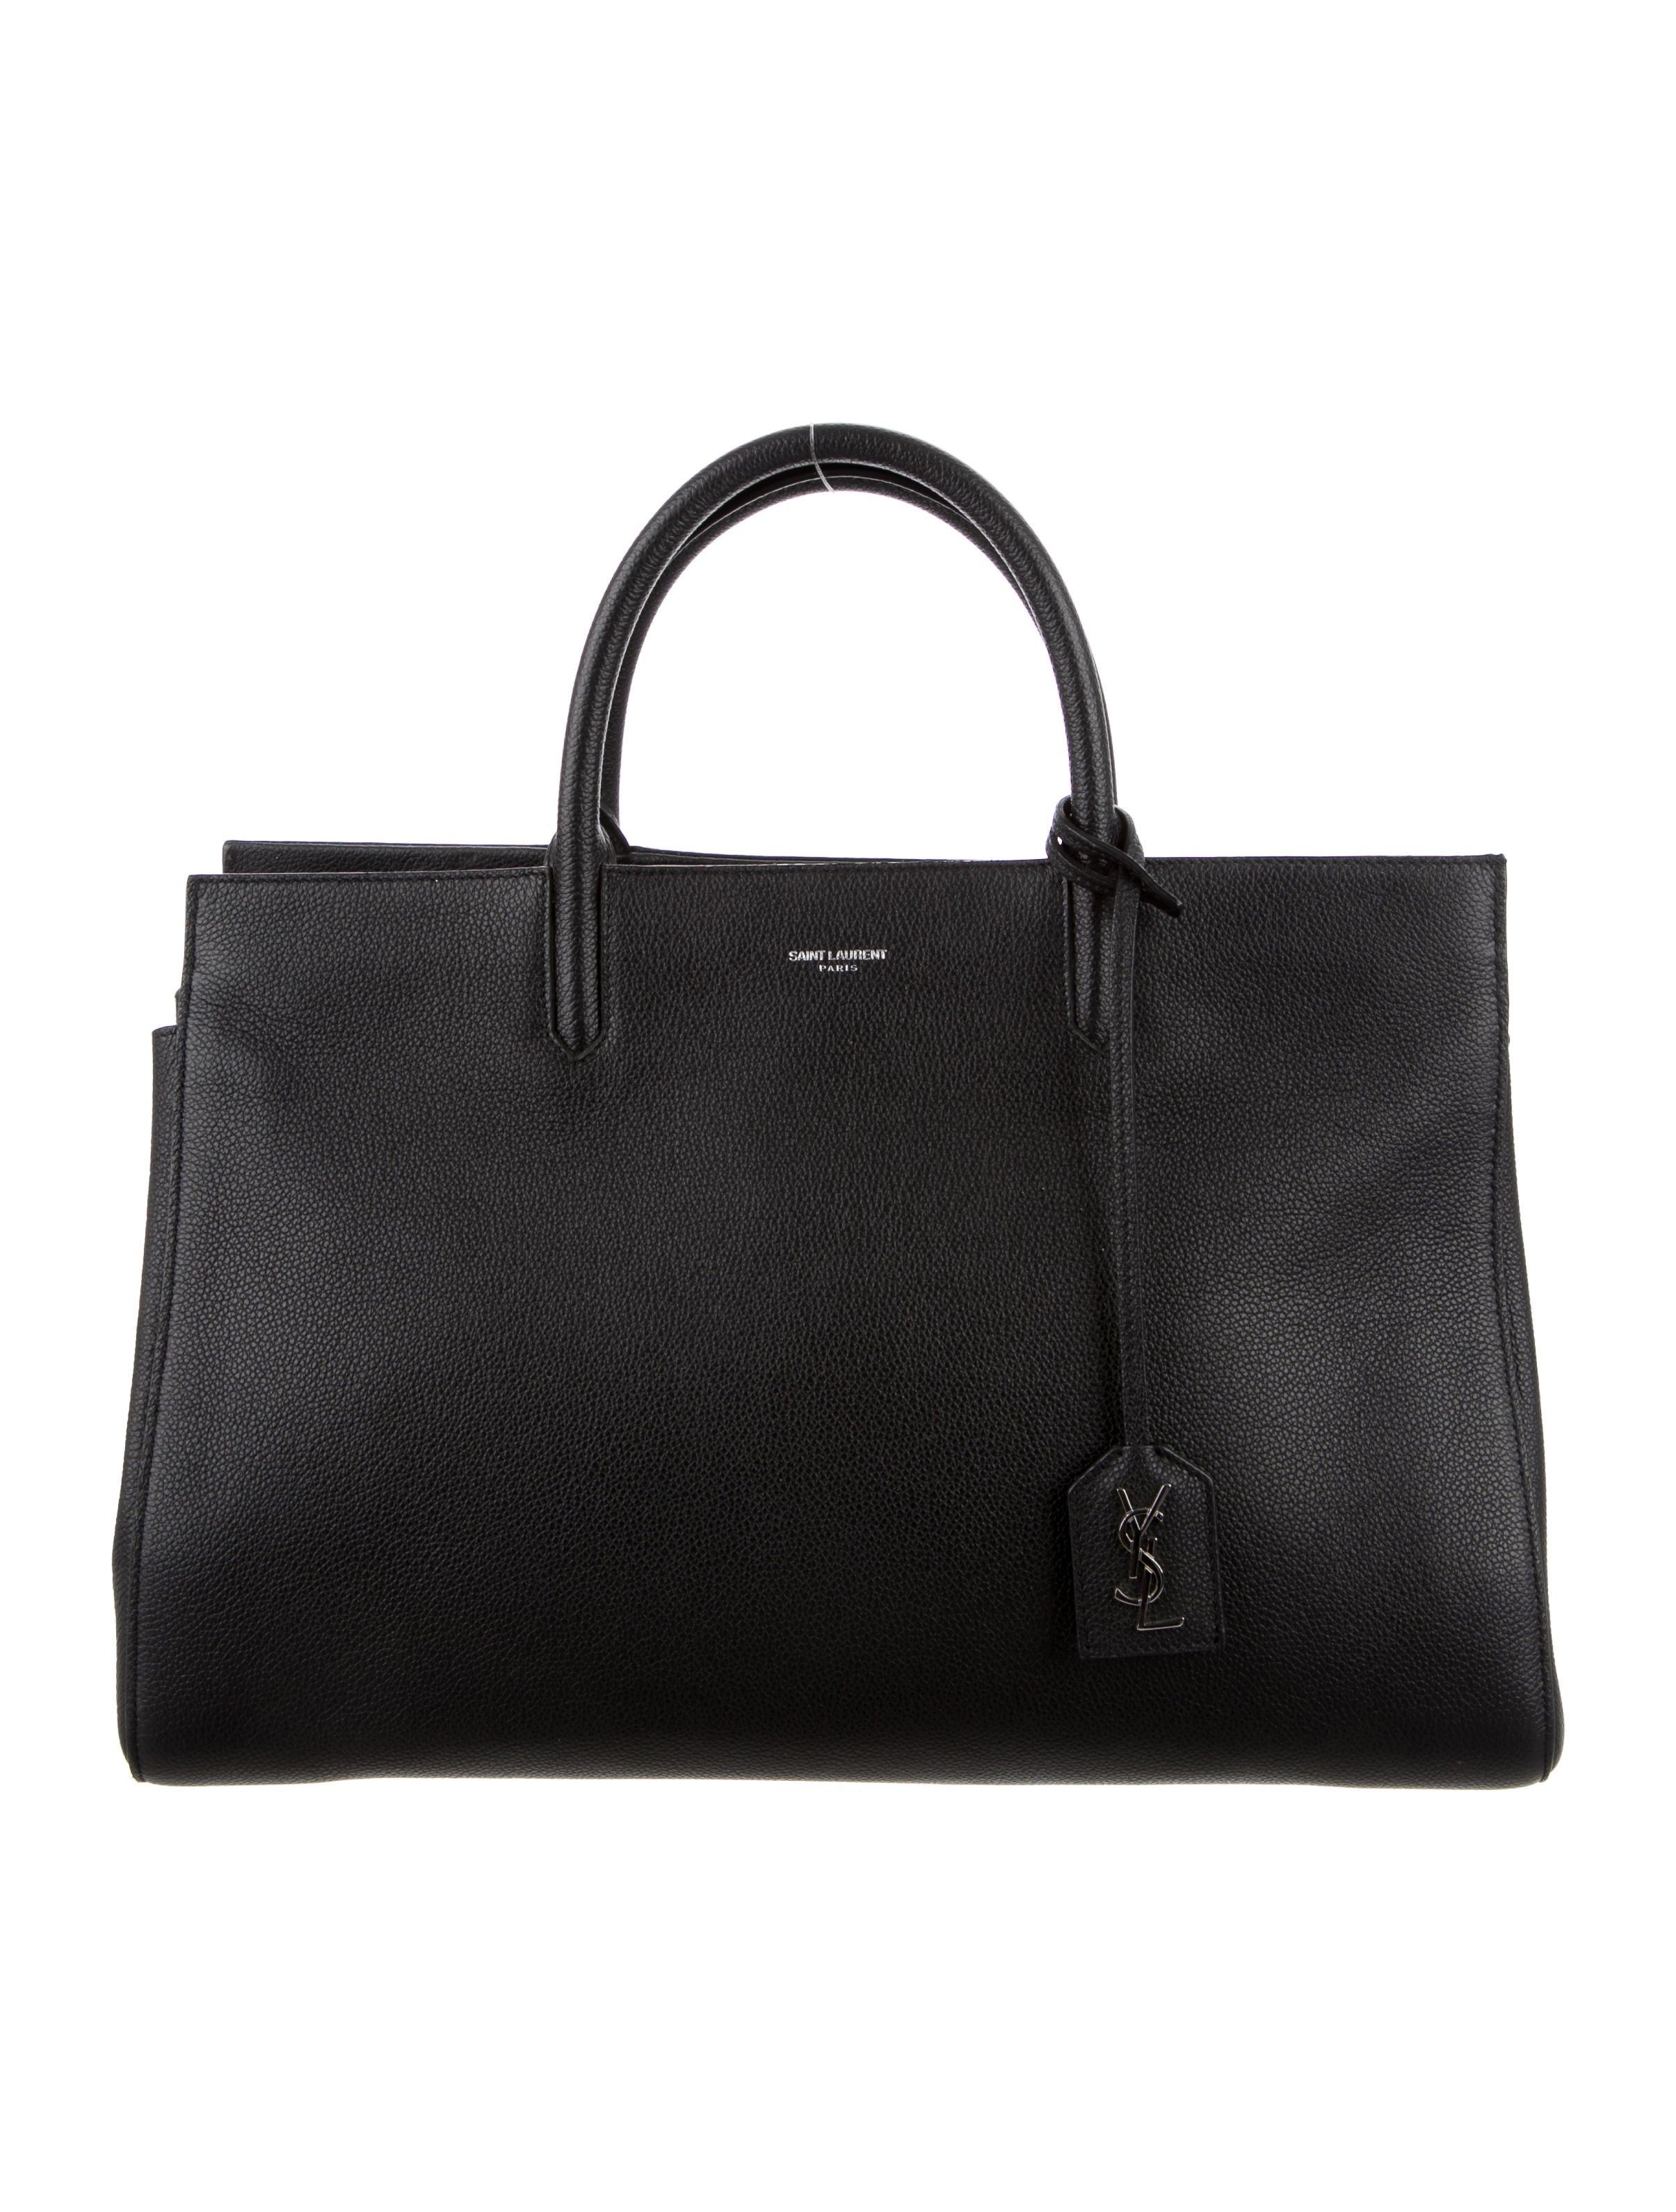 7b8ed33794 Saint Laurent Medium Cabas Rive Gauche Bag - Handbags - SNT28467 ...